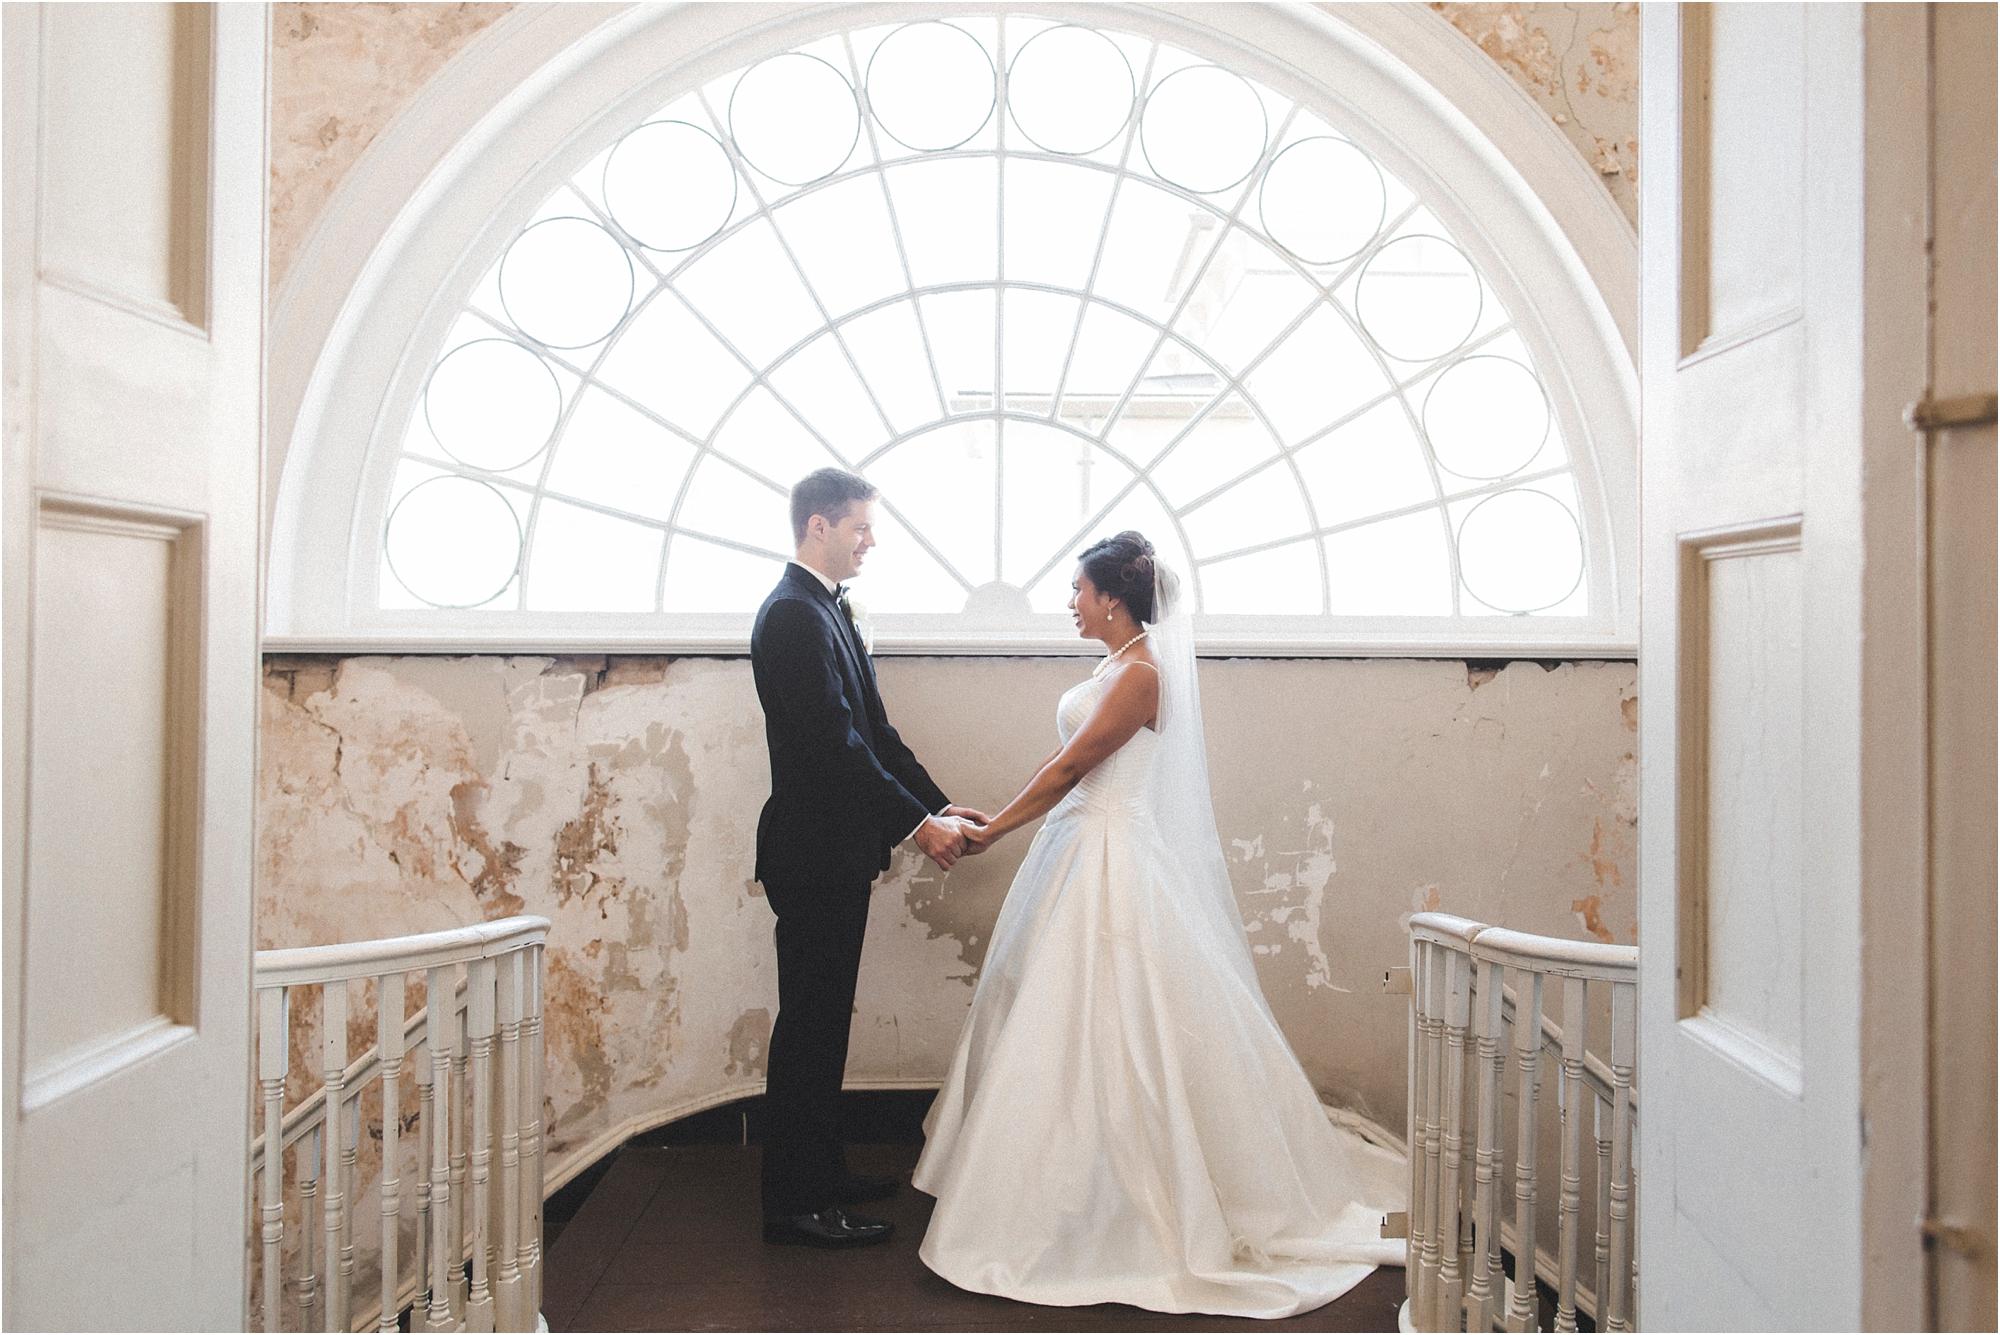 stephanie-yonce-photography-historic-church-virginia-museu-fine-arts-wedding-photos_023.JPG